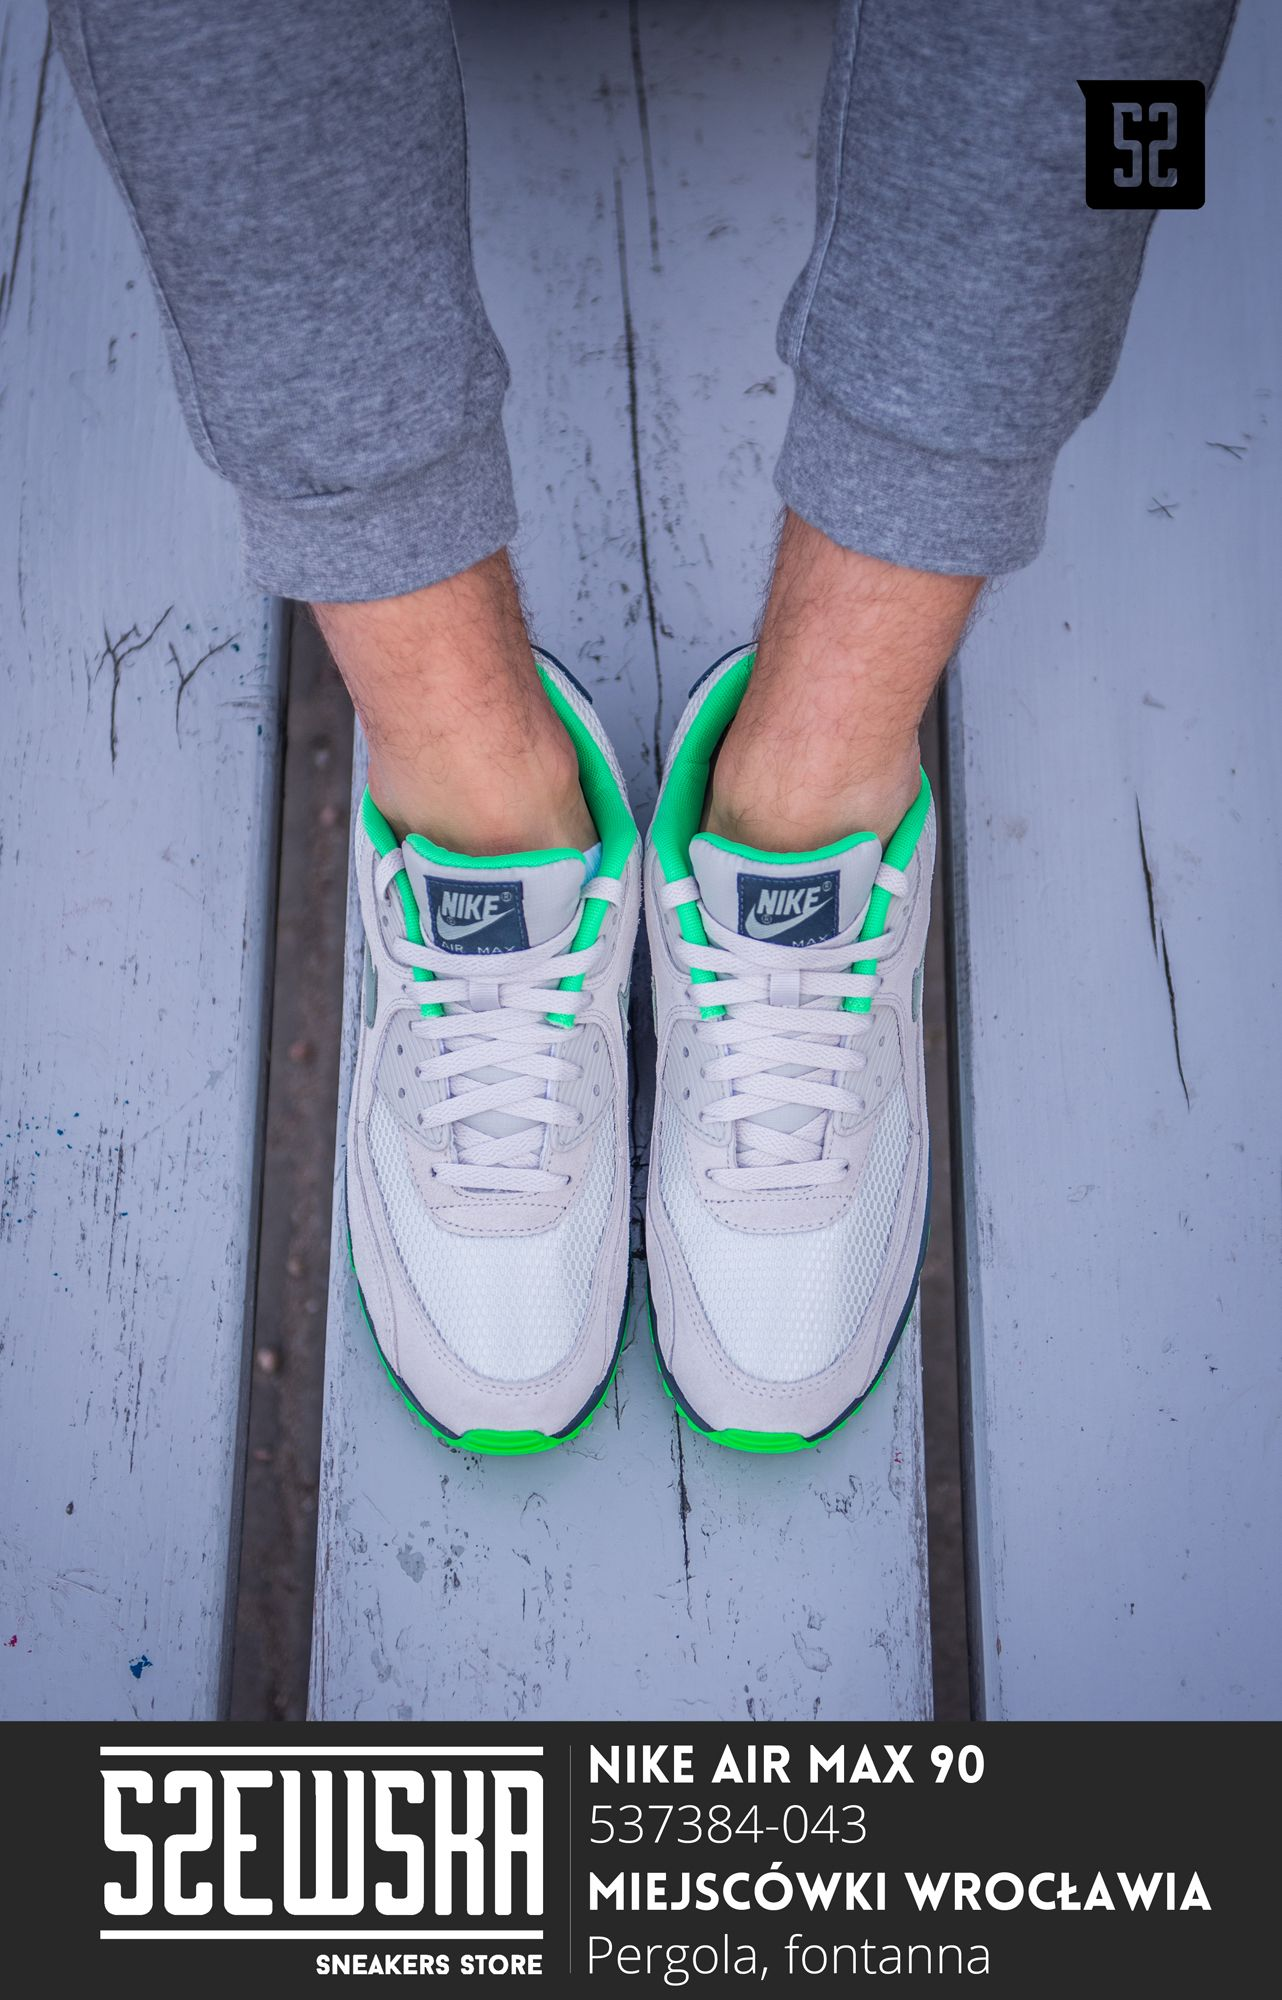 Nike Air Max 90 | 537384-043 | Szewska Sneakers Store | e-szewska.pl